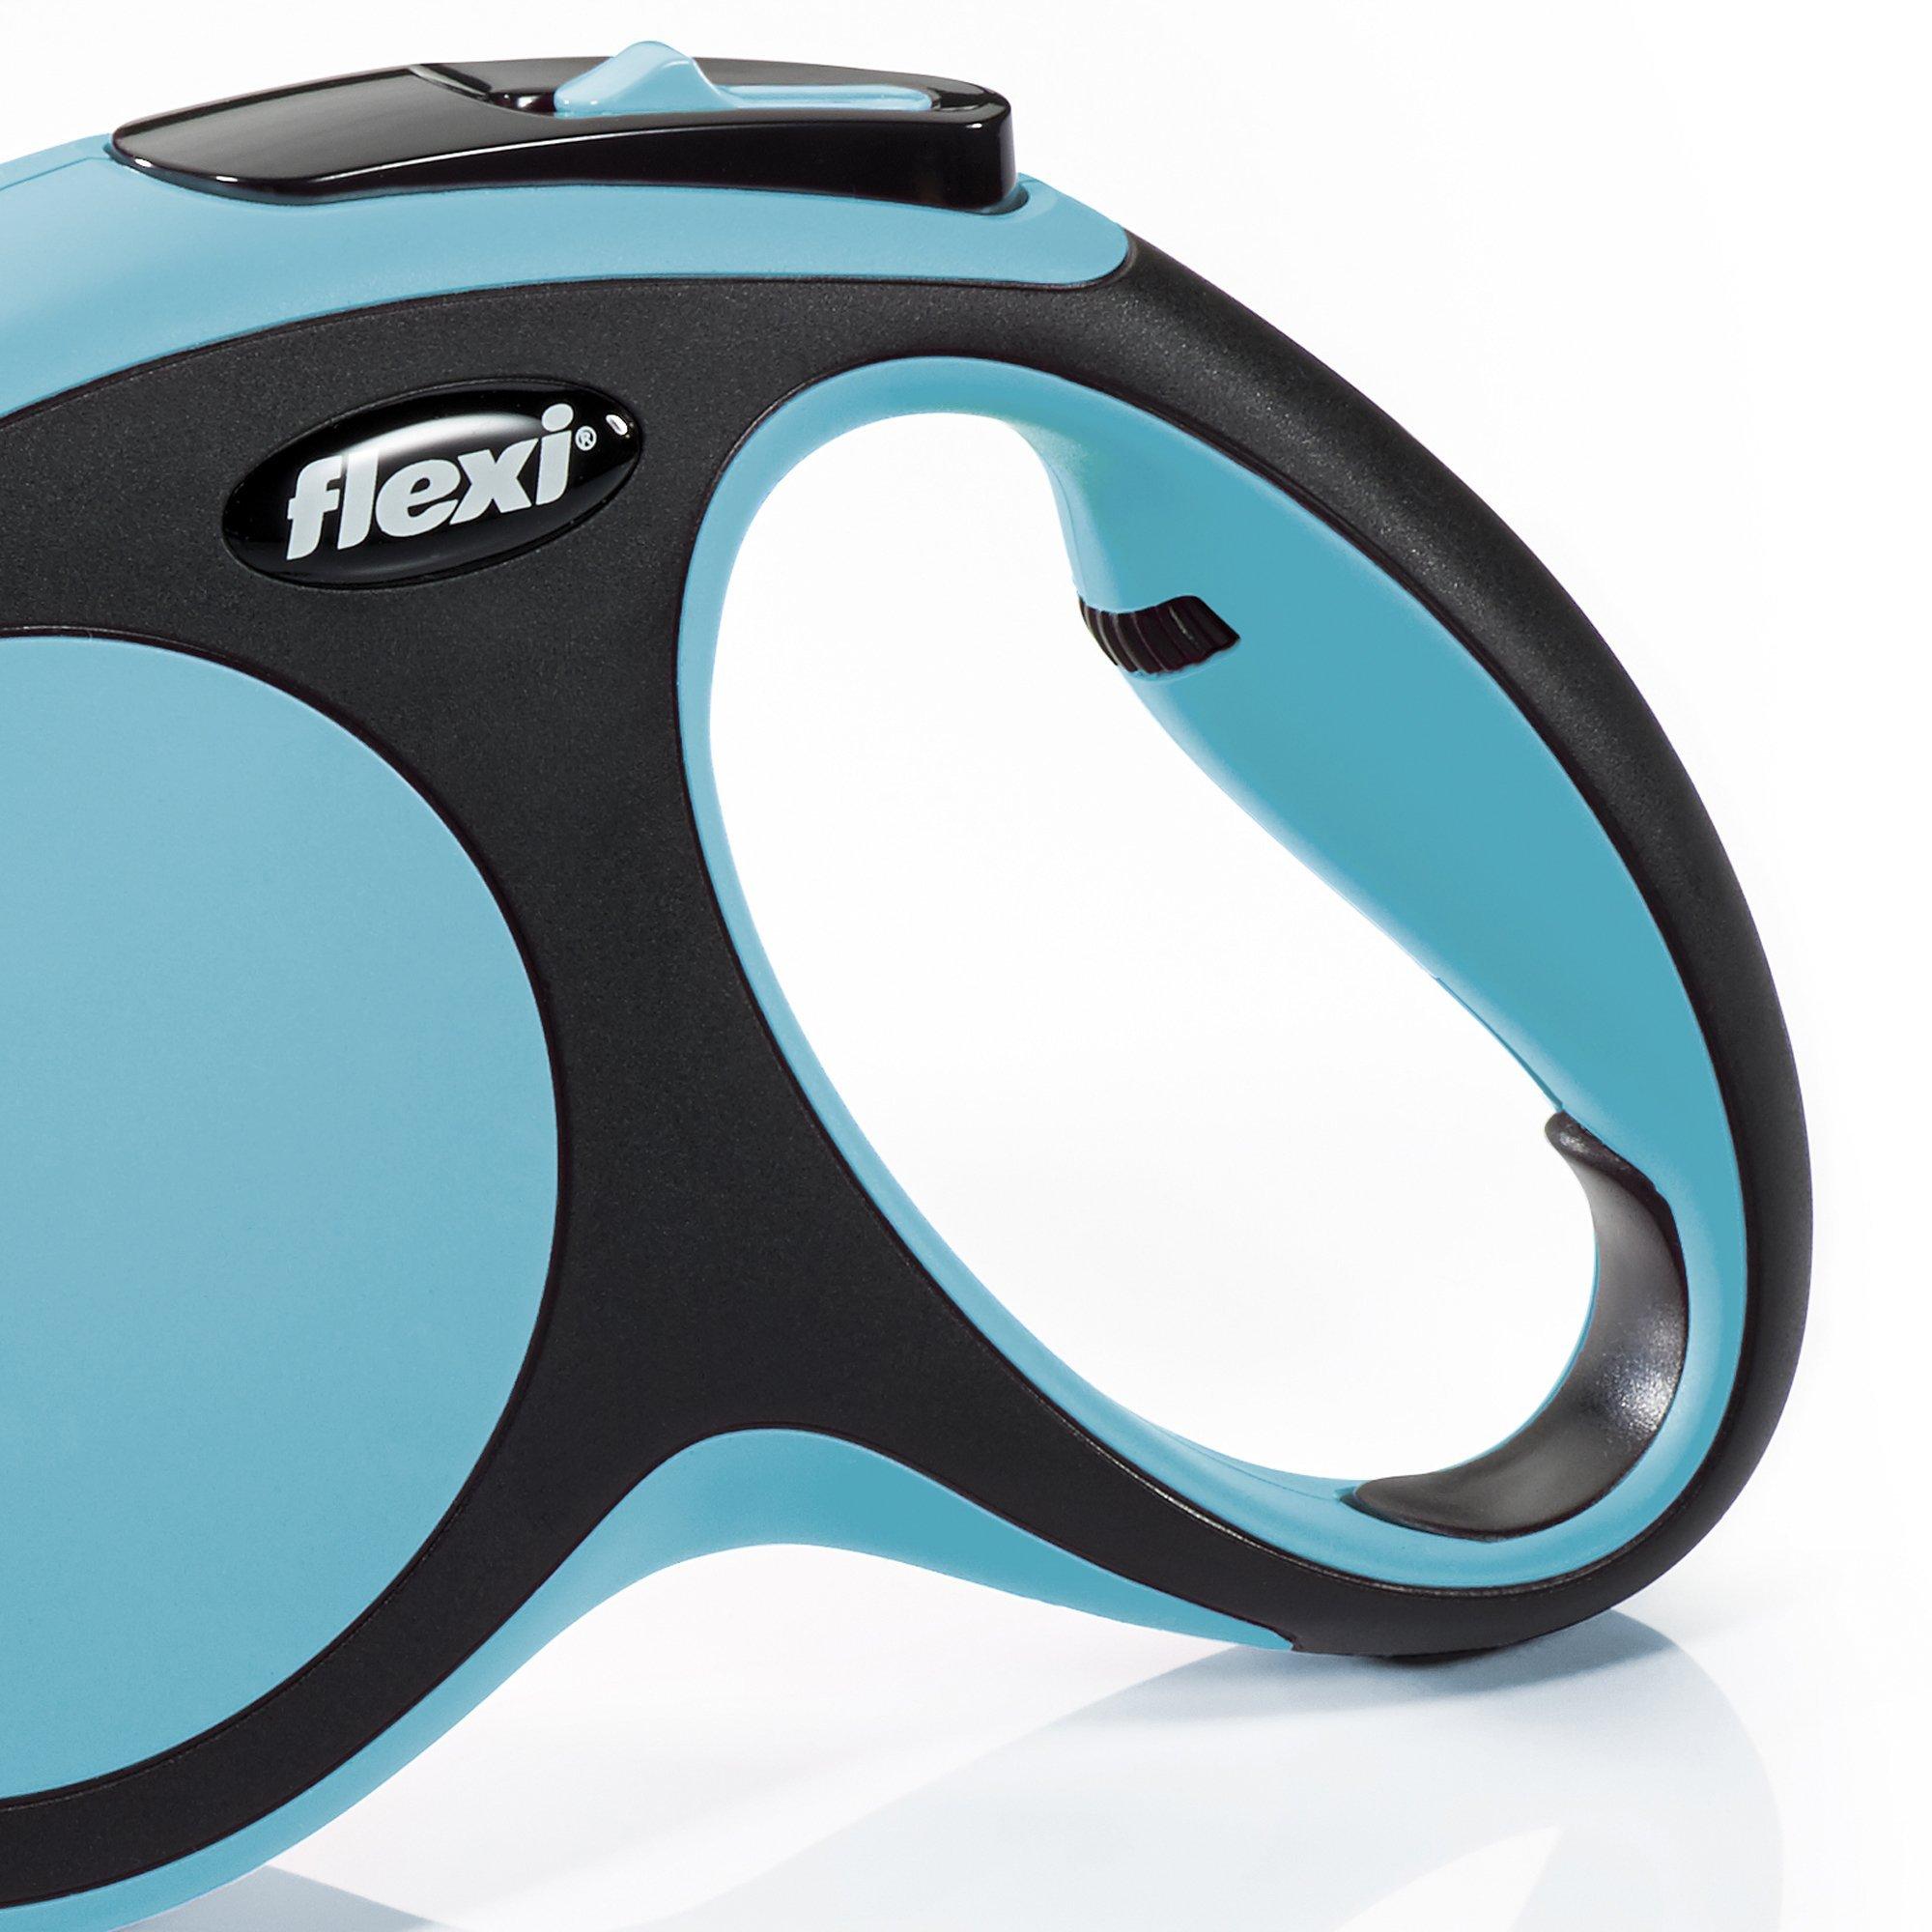 Flexi New Comfort Retractable Dog Leash (Tape), 16 ft, Medium, Blue by Flexi (Image #2)